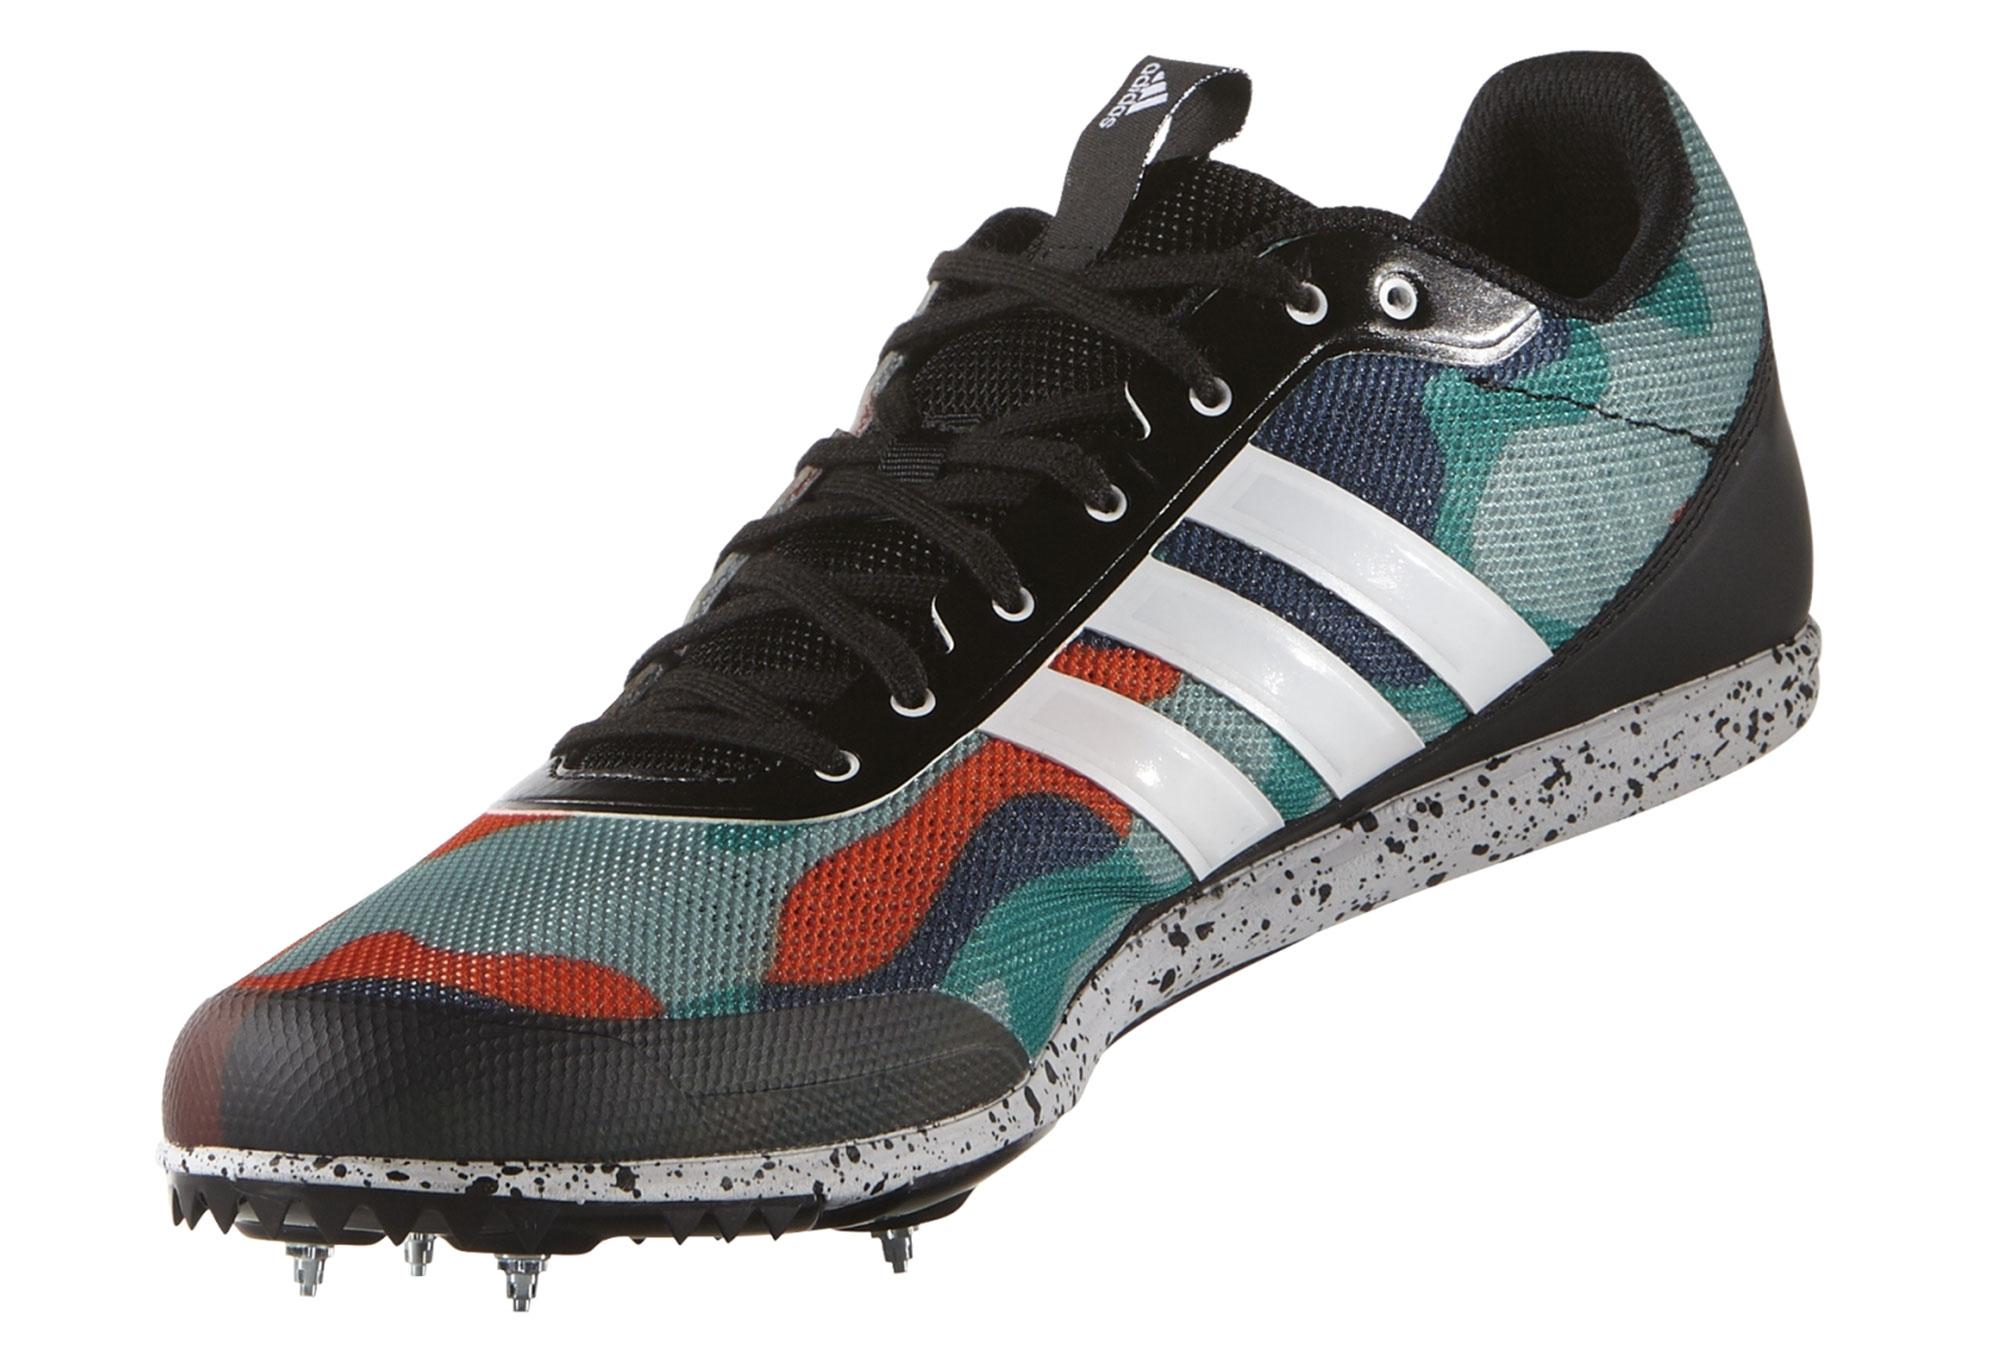 Chaussures d'Athlétisme adidas running Distancestar Noir Multi